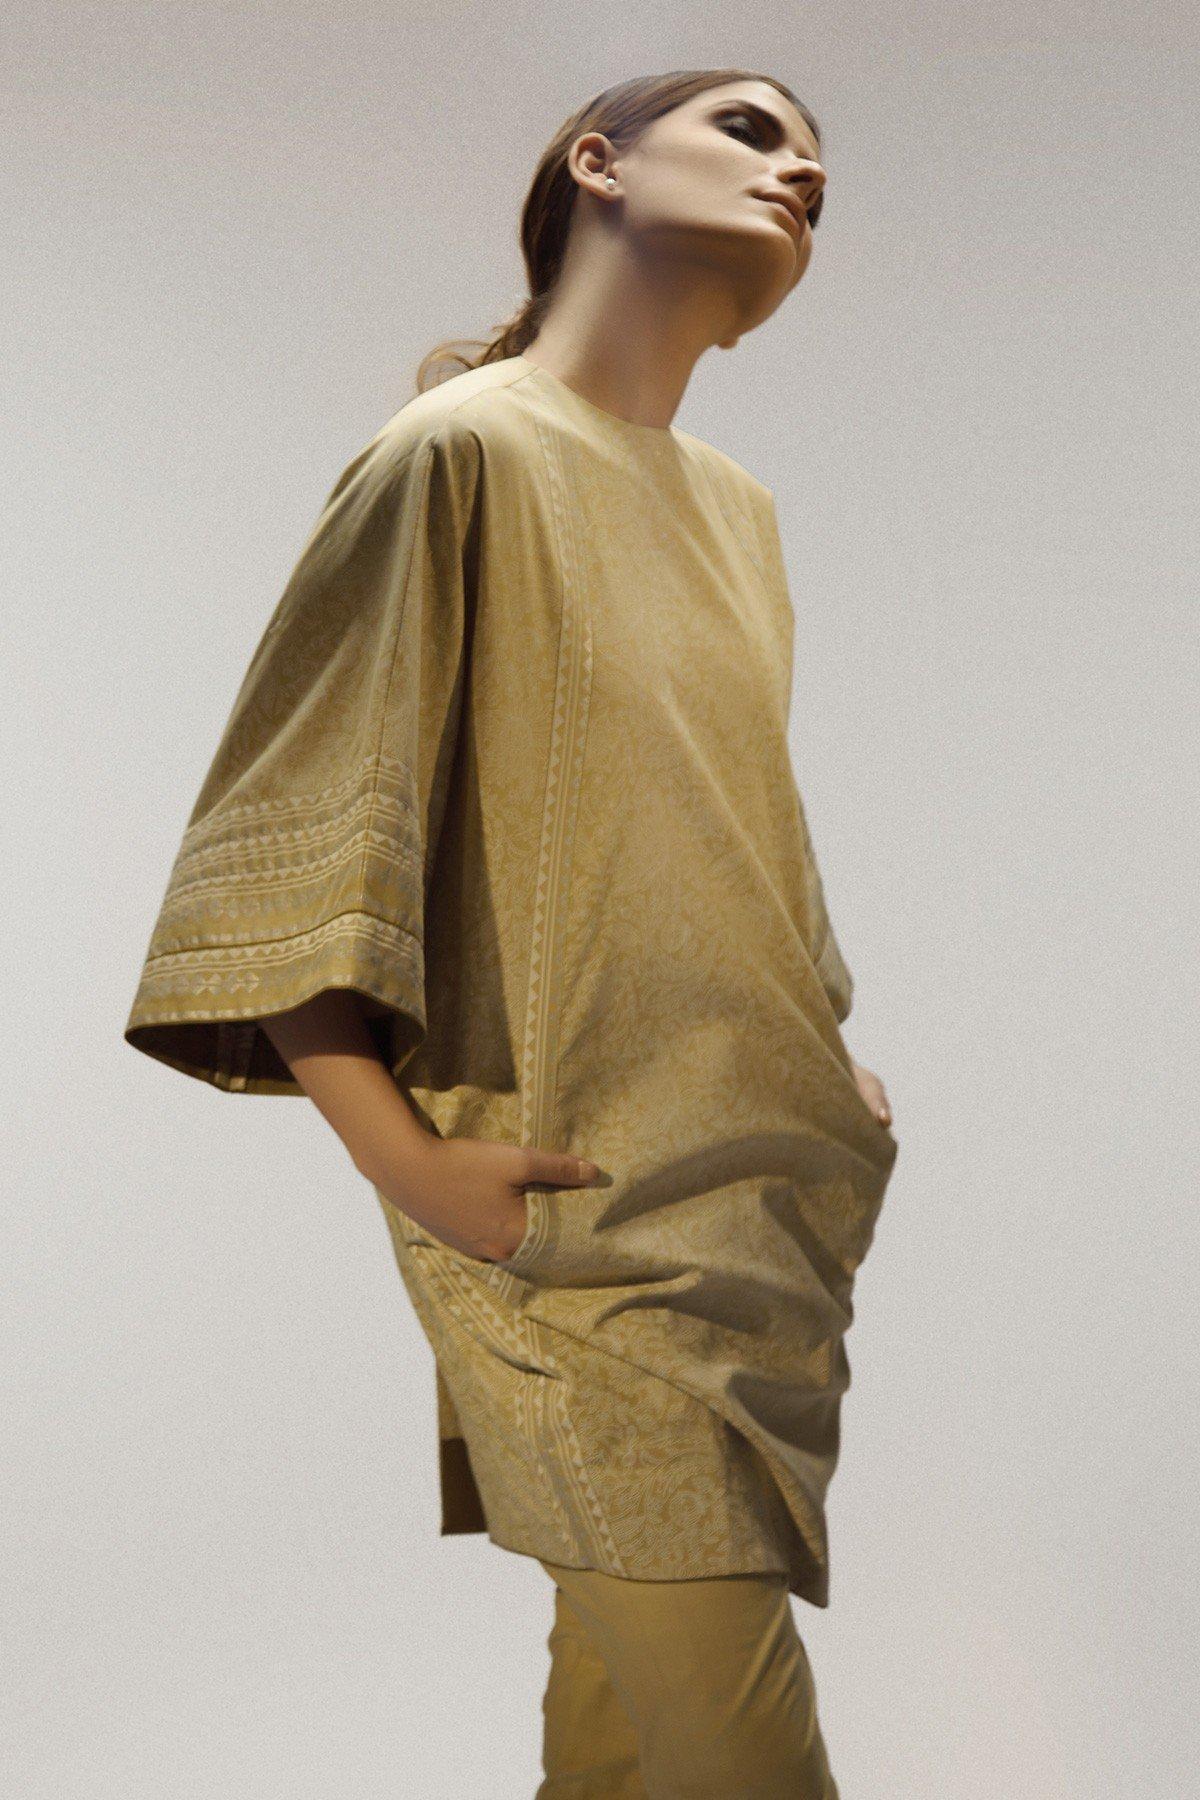 /2019/02/alkaram-studio-catalyst-collection-printed-cambric-shirt-image1.jpg